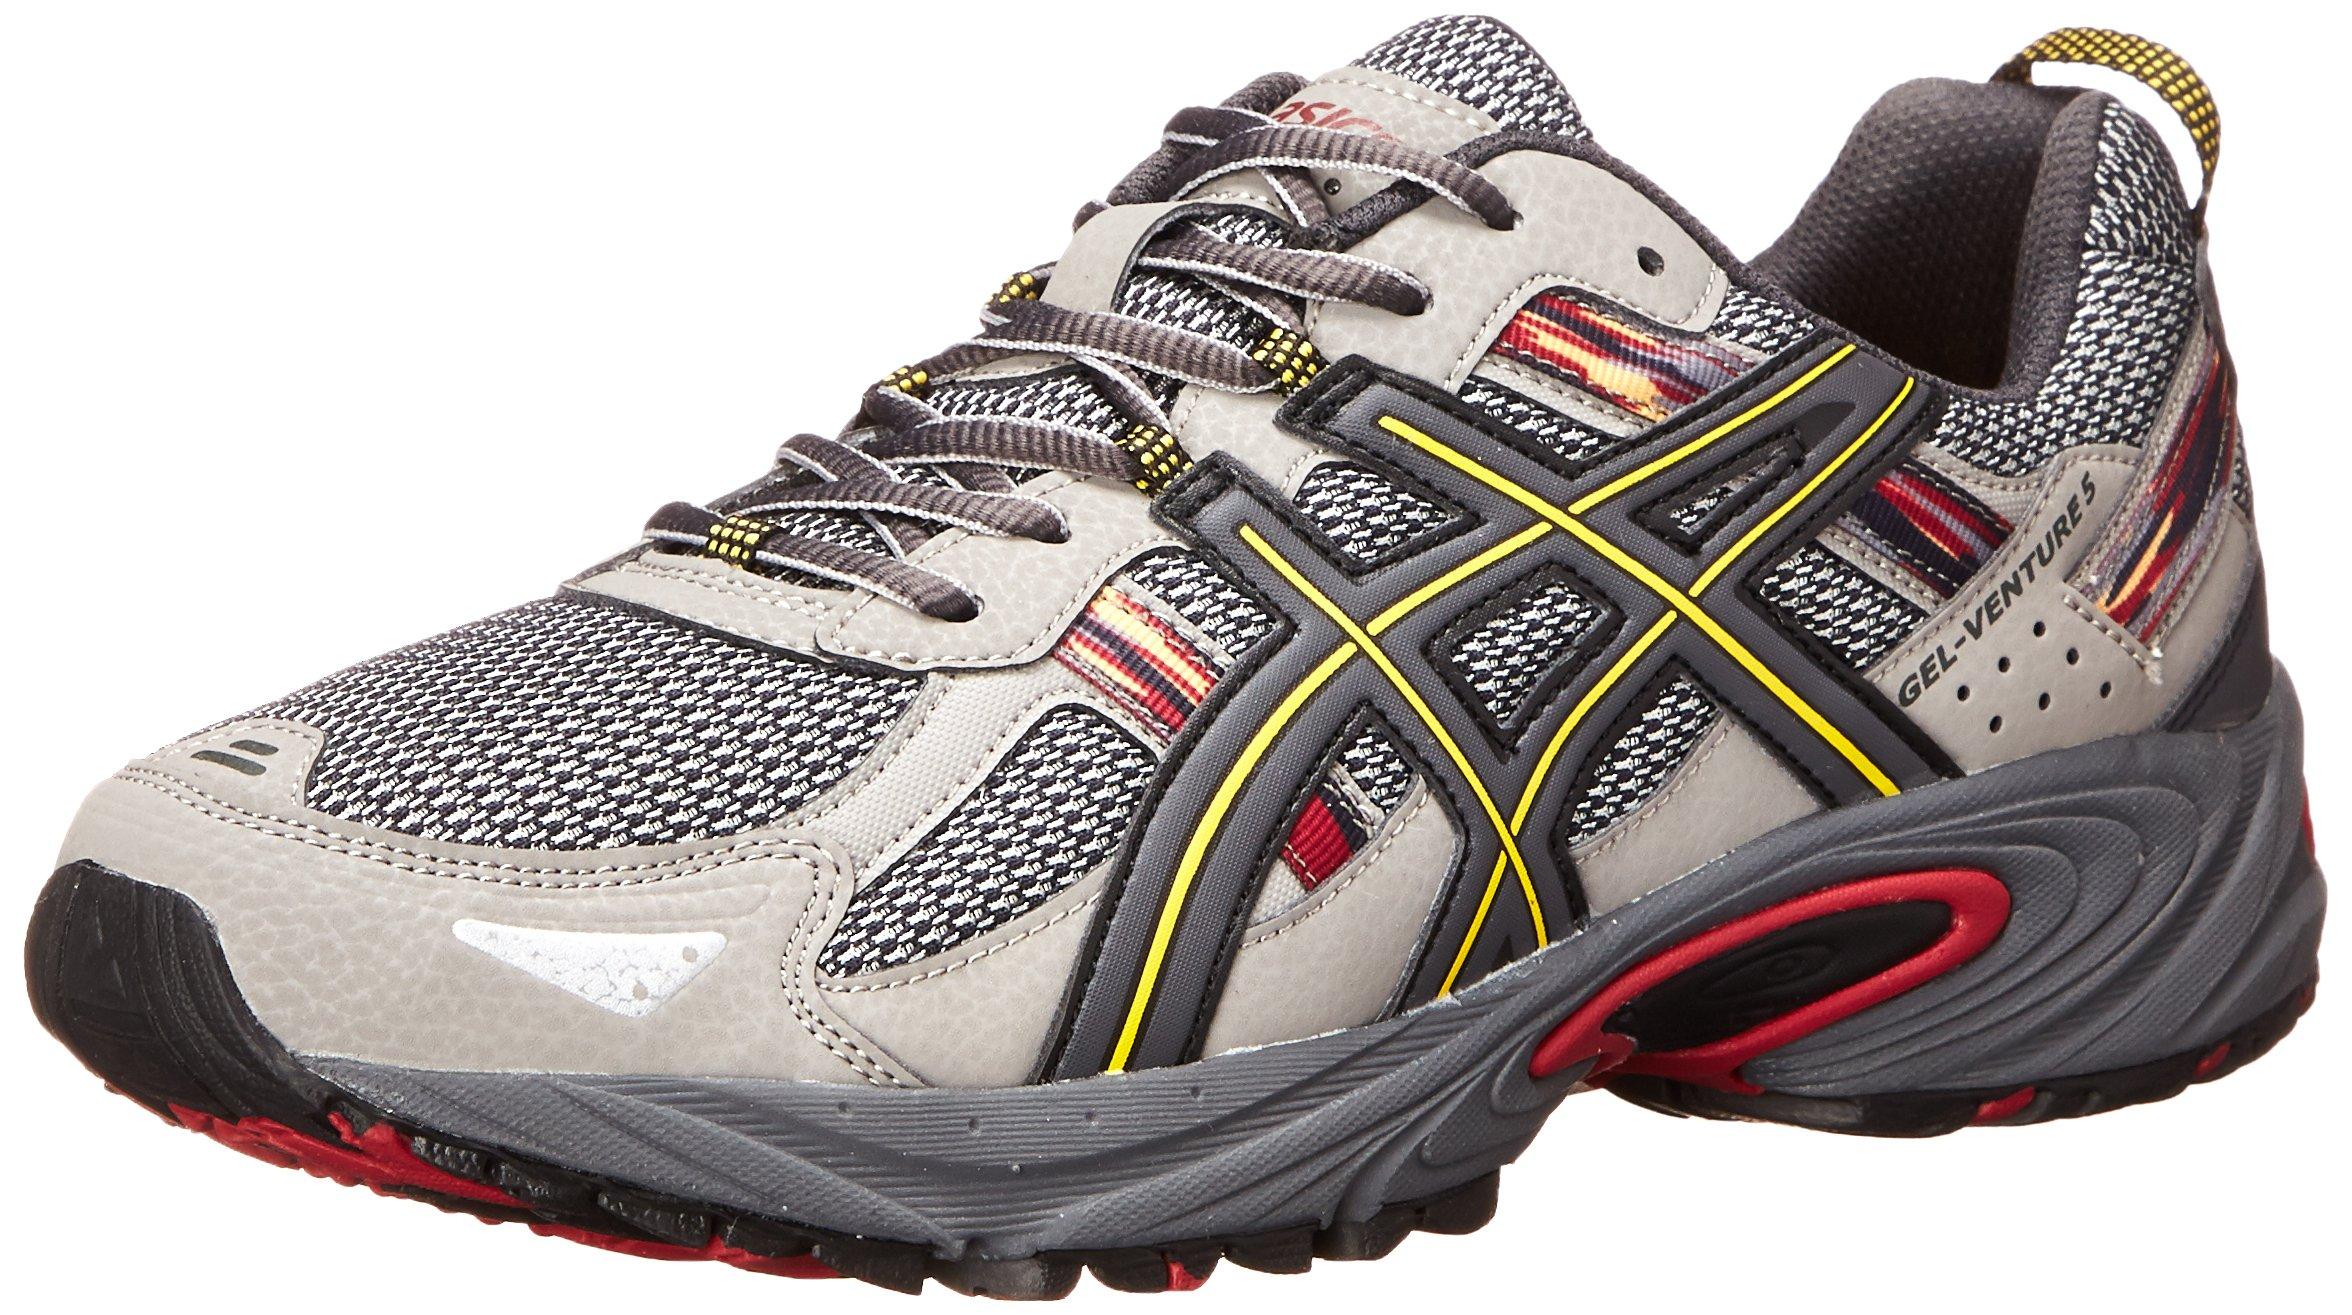 ASICS Men's Gel-Venture 5-M, Light Grey/Graphite/Red, 8 M US